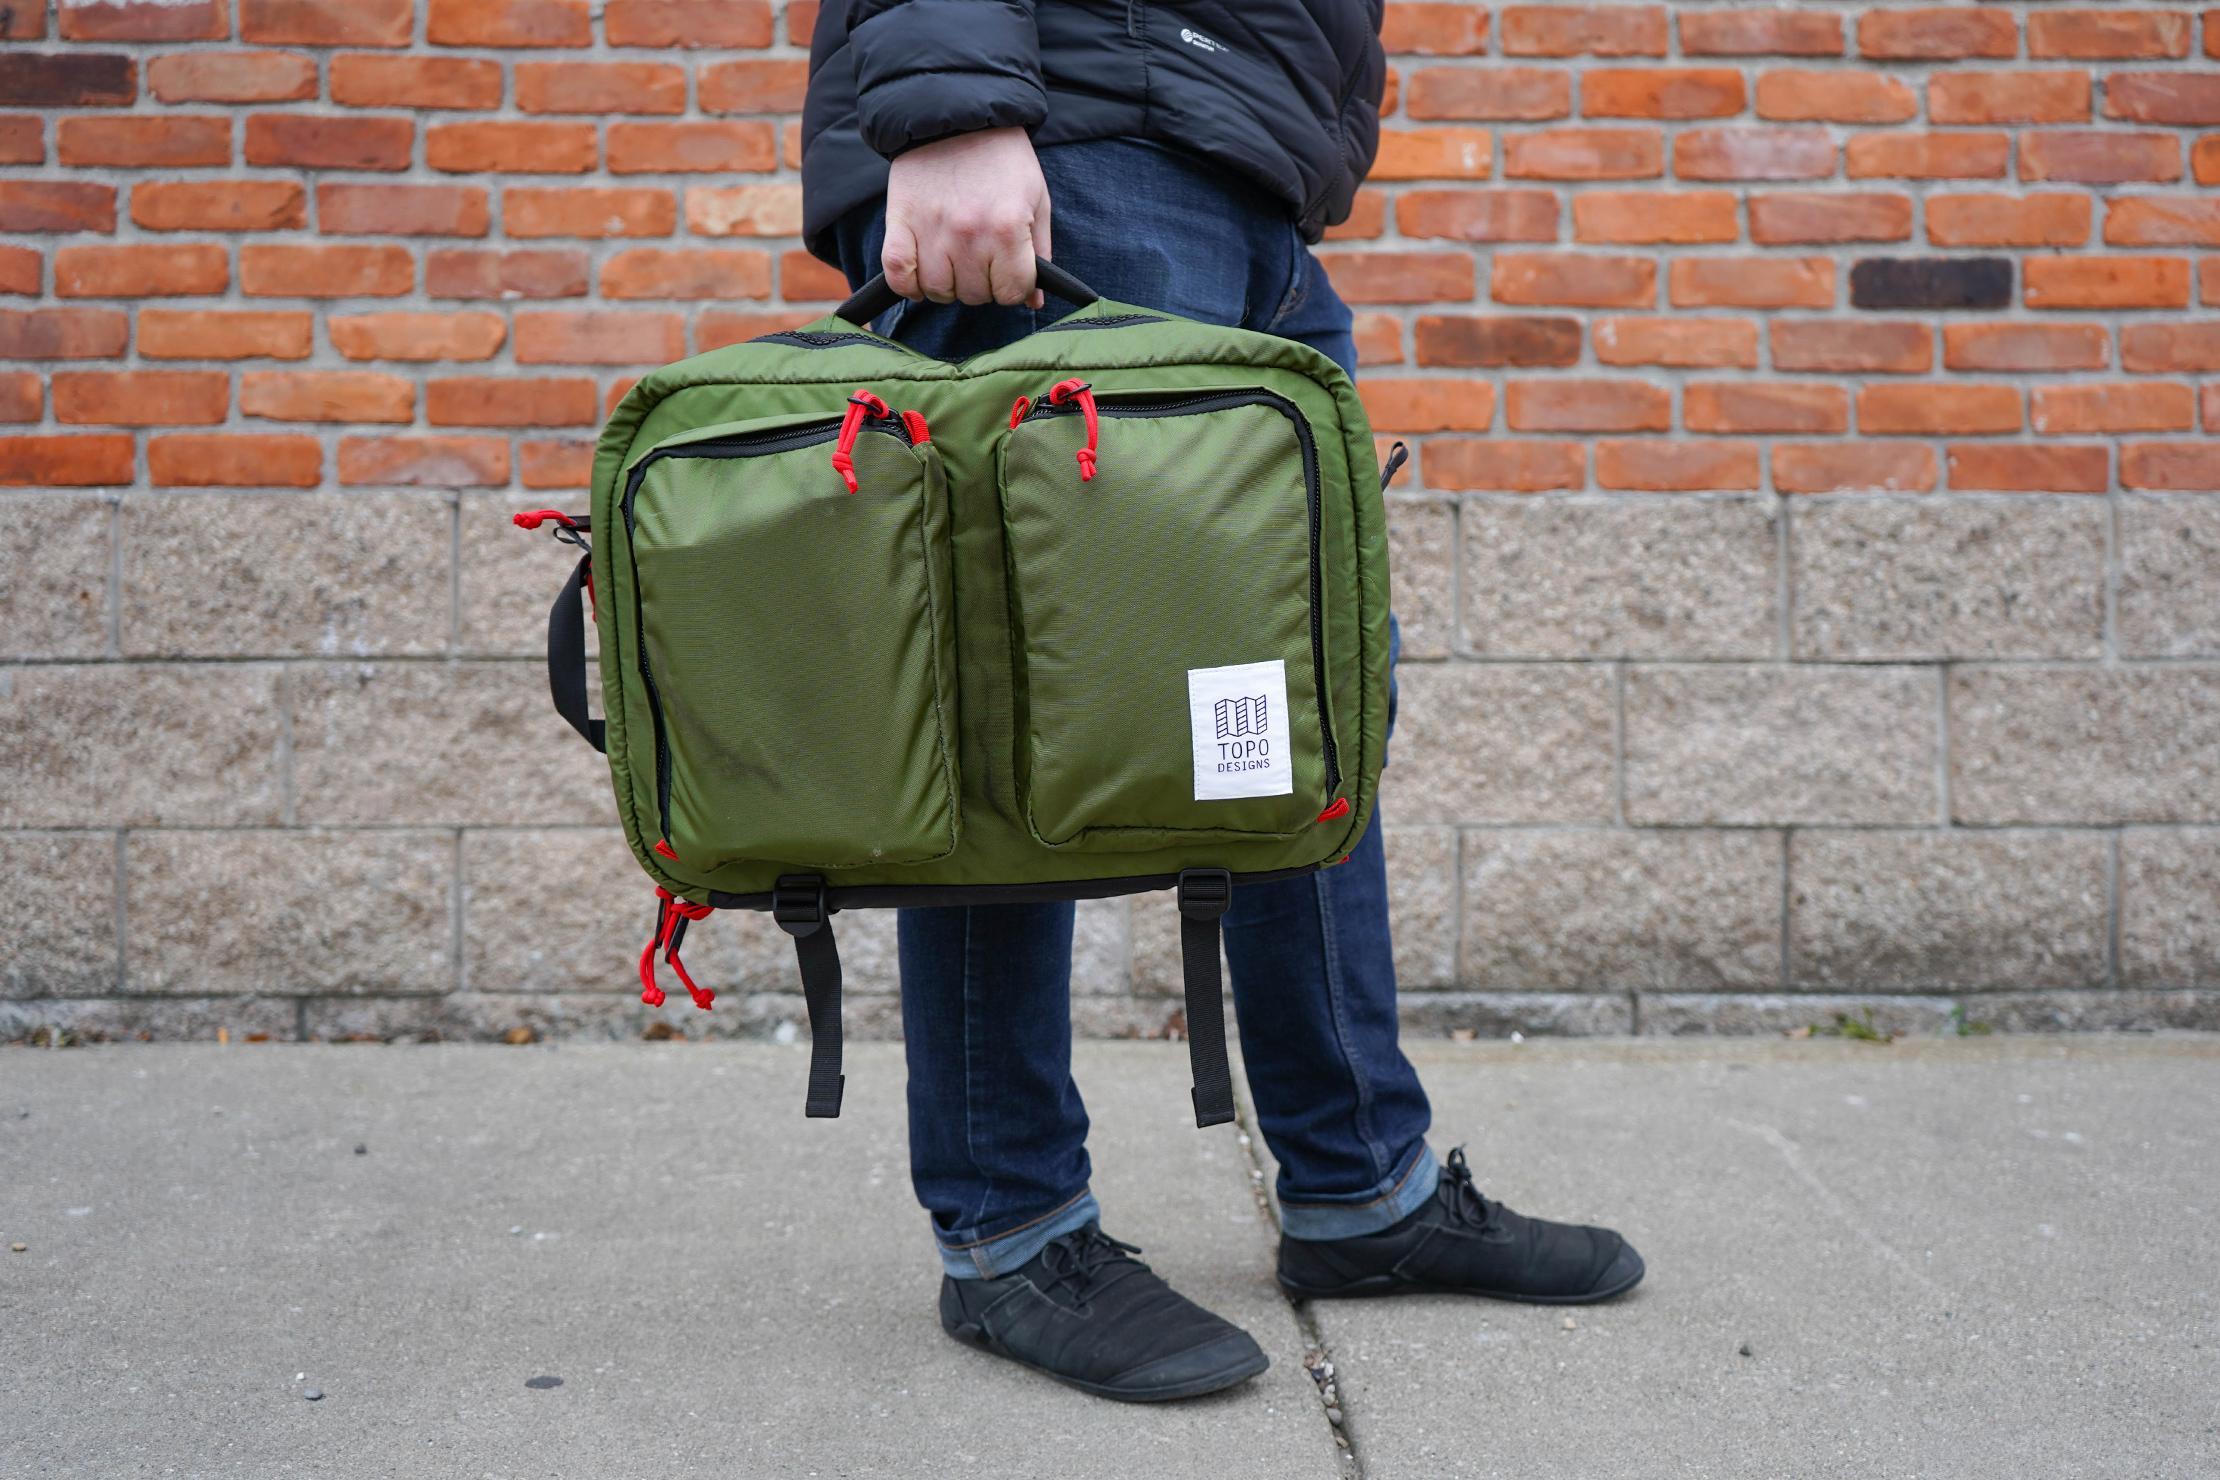 Topo Designs Global Briefcase 3-Day Briefcase Carry